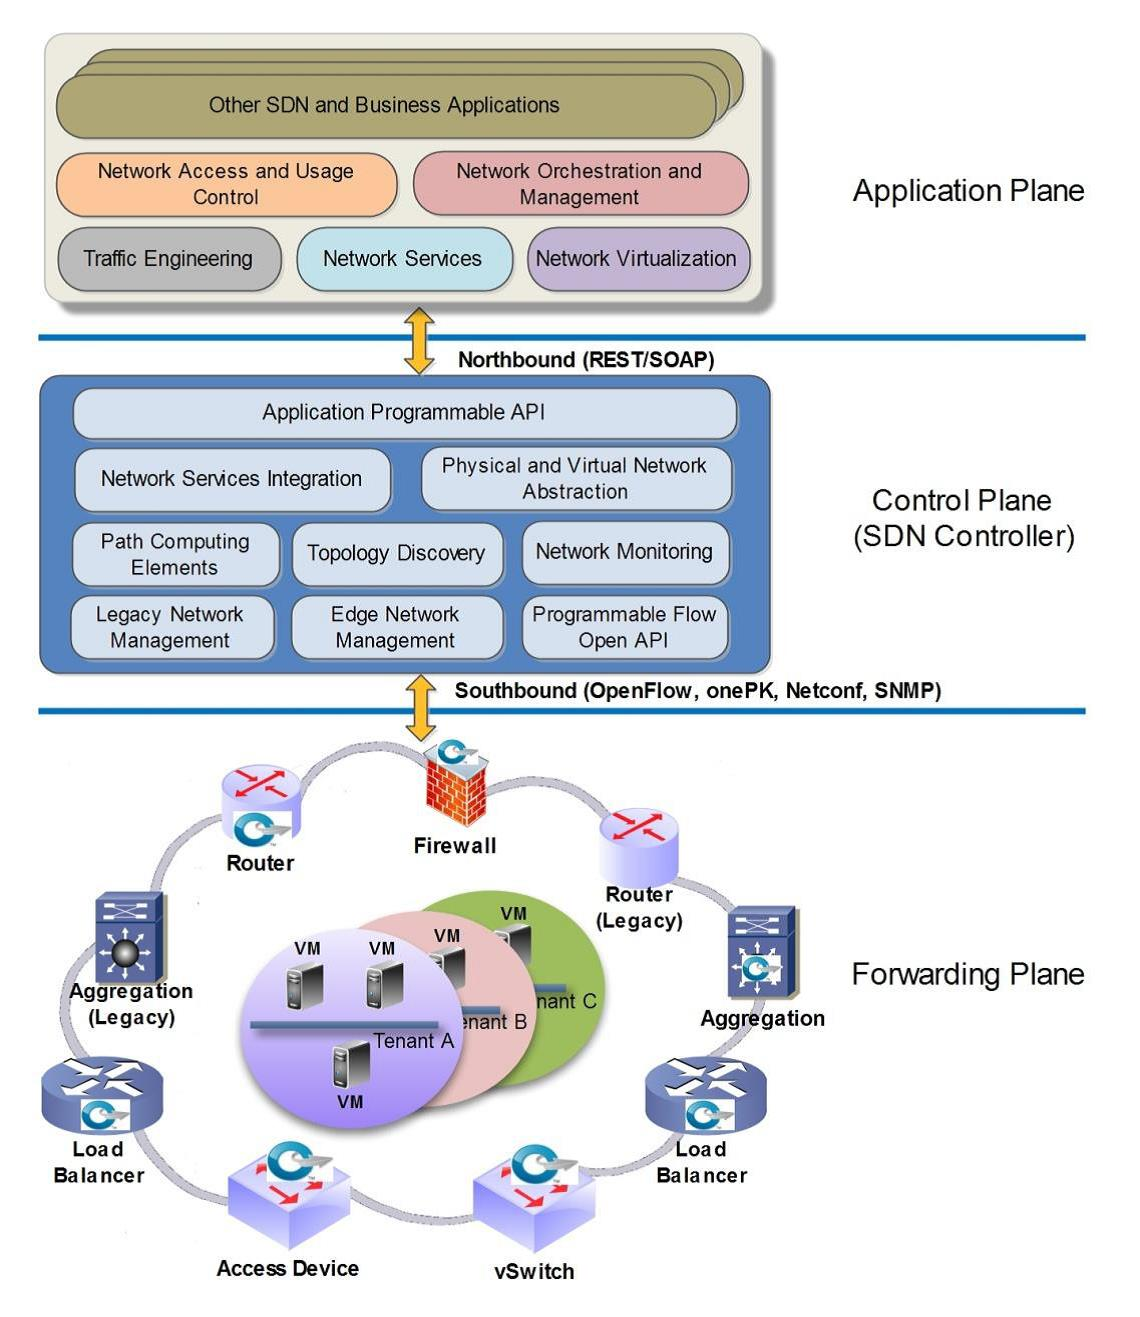 معماری SDN